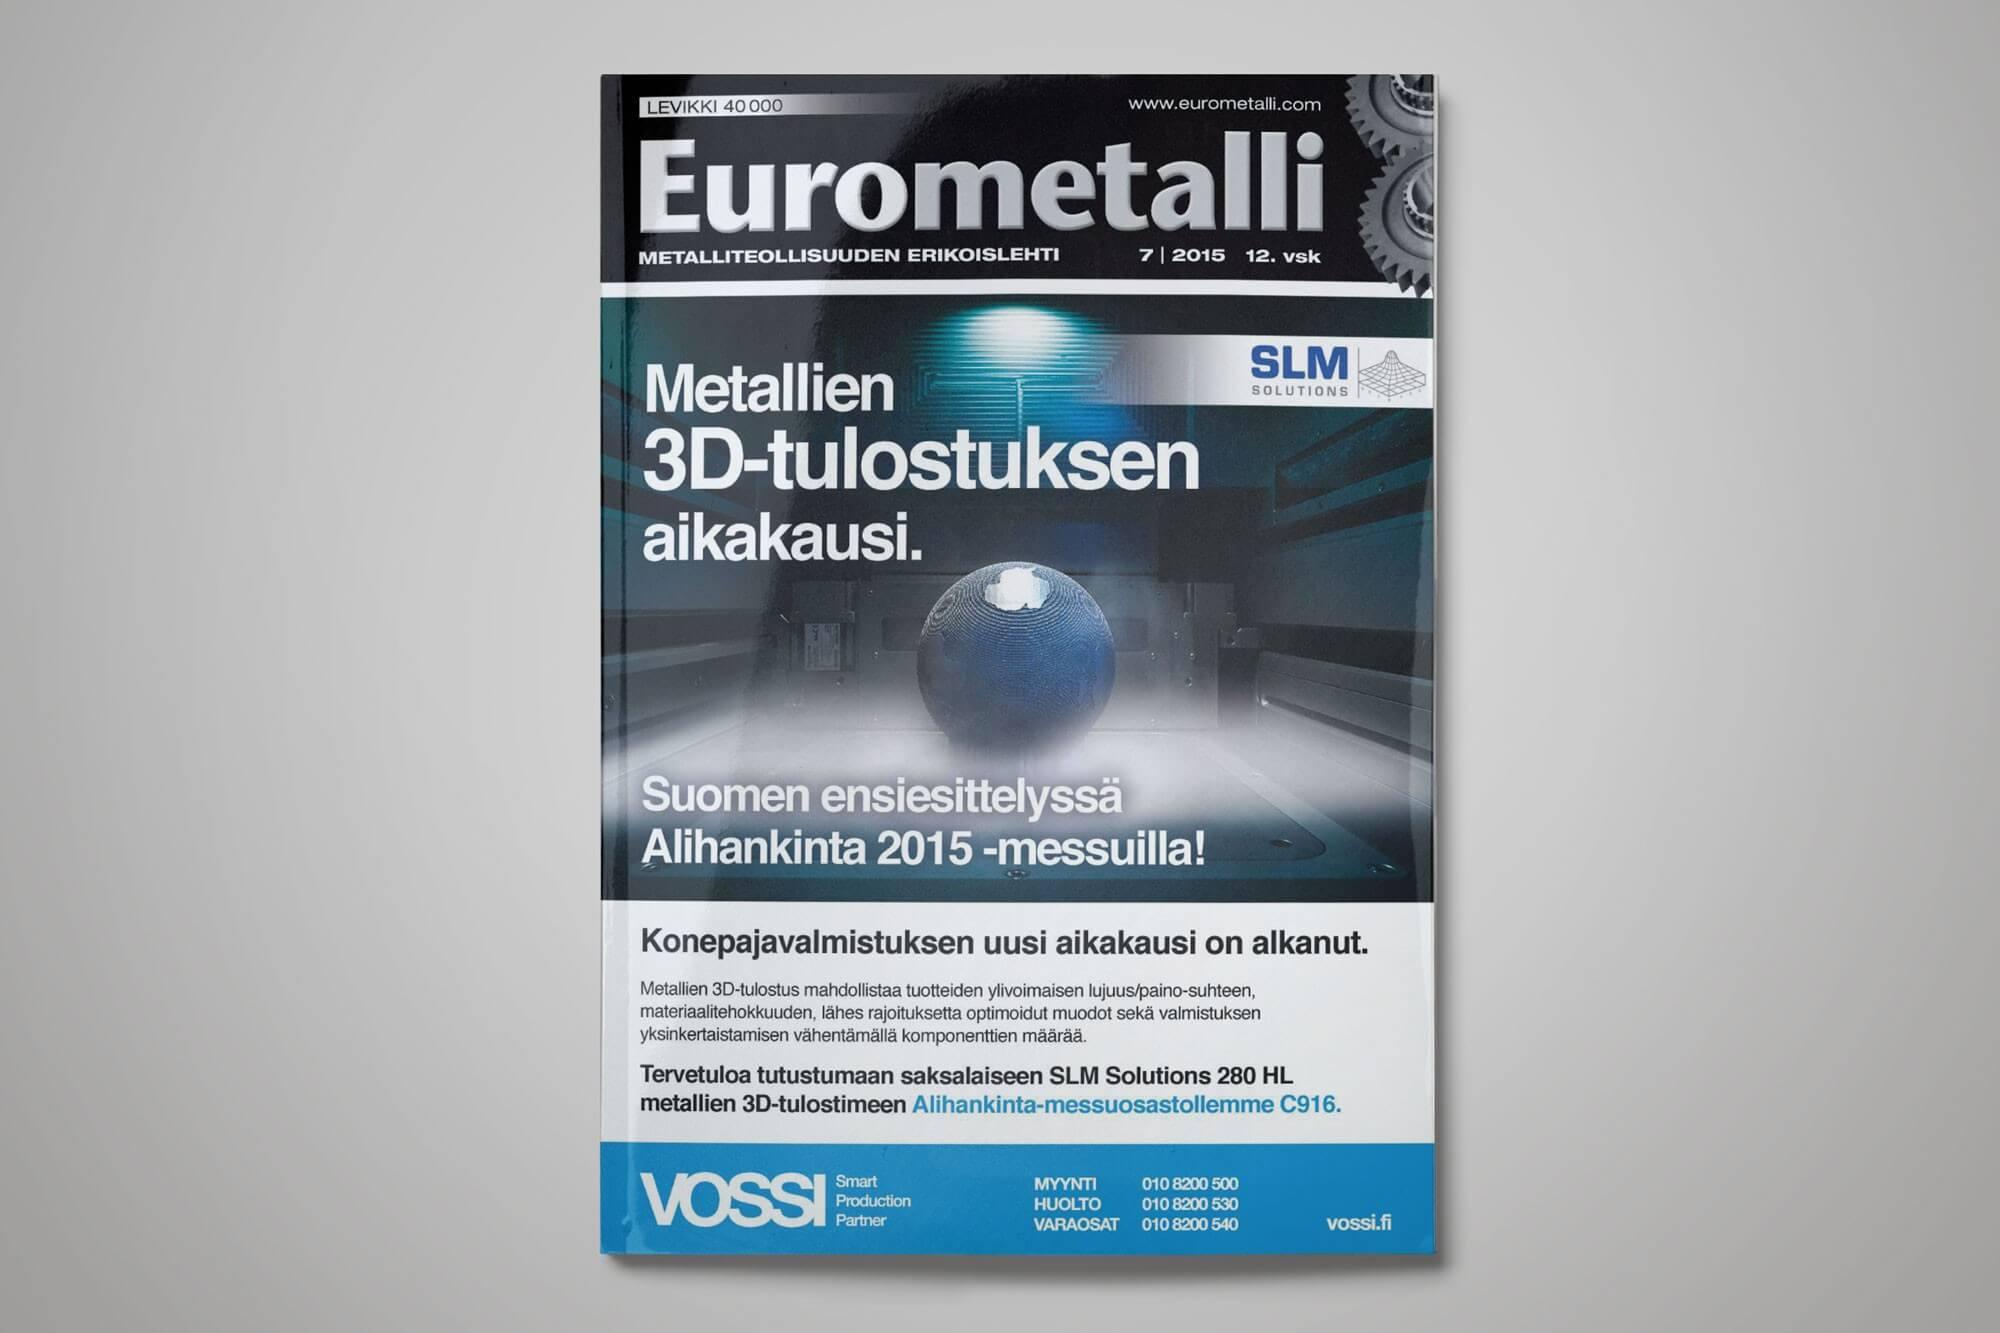 Eurometalli mainonta